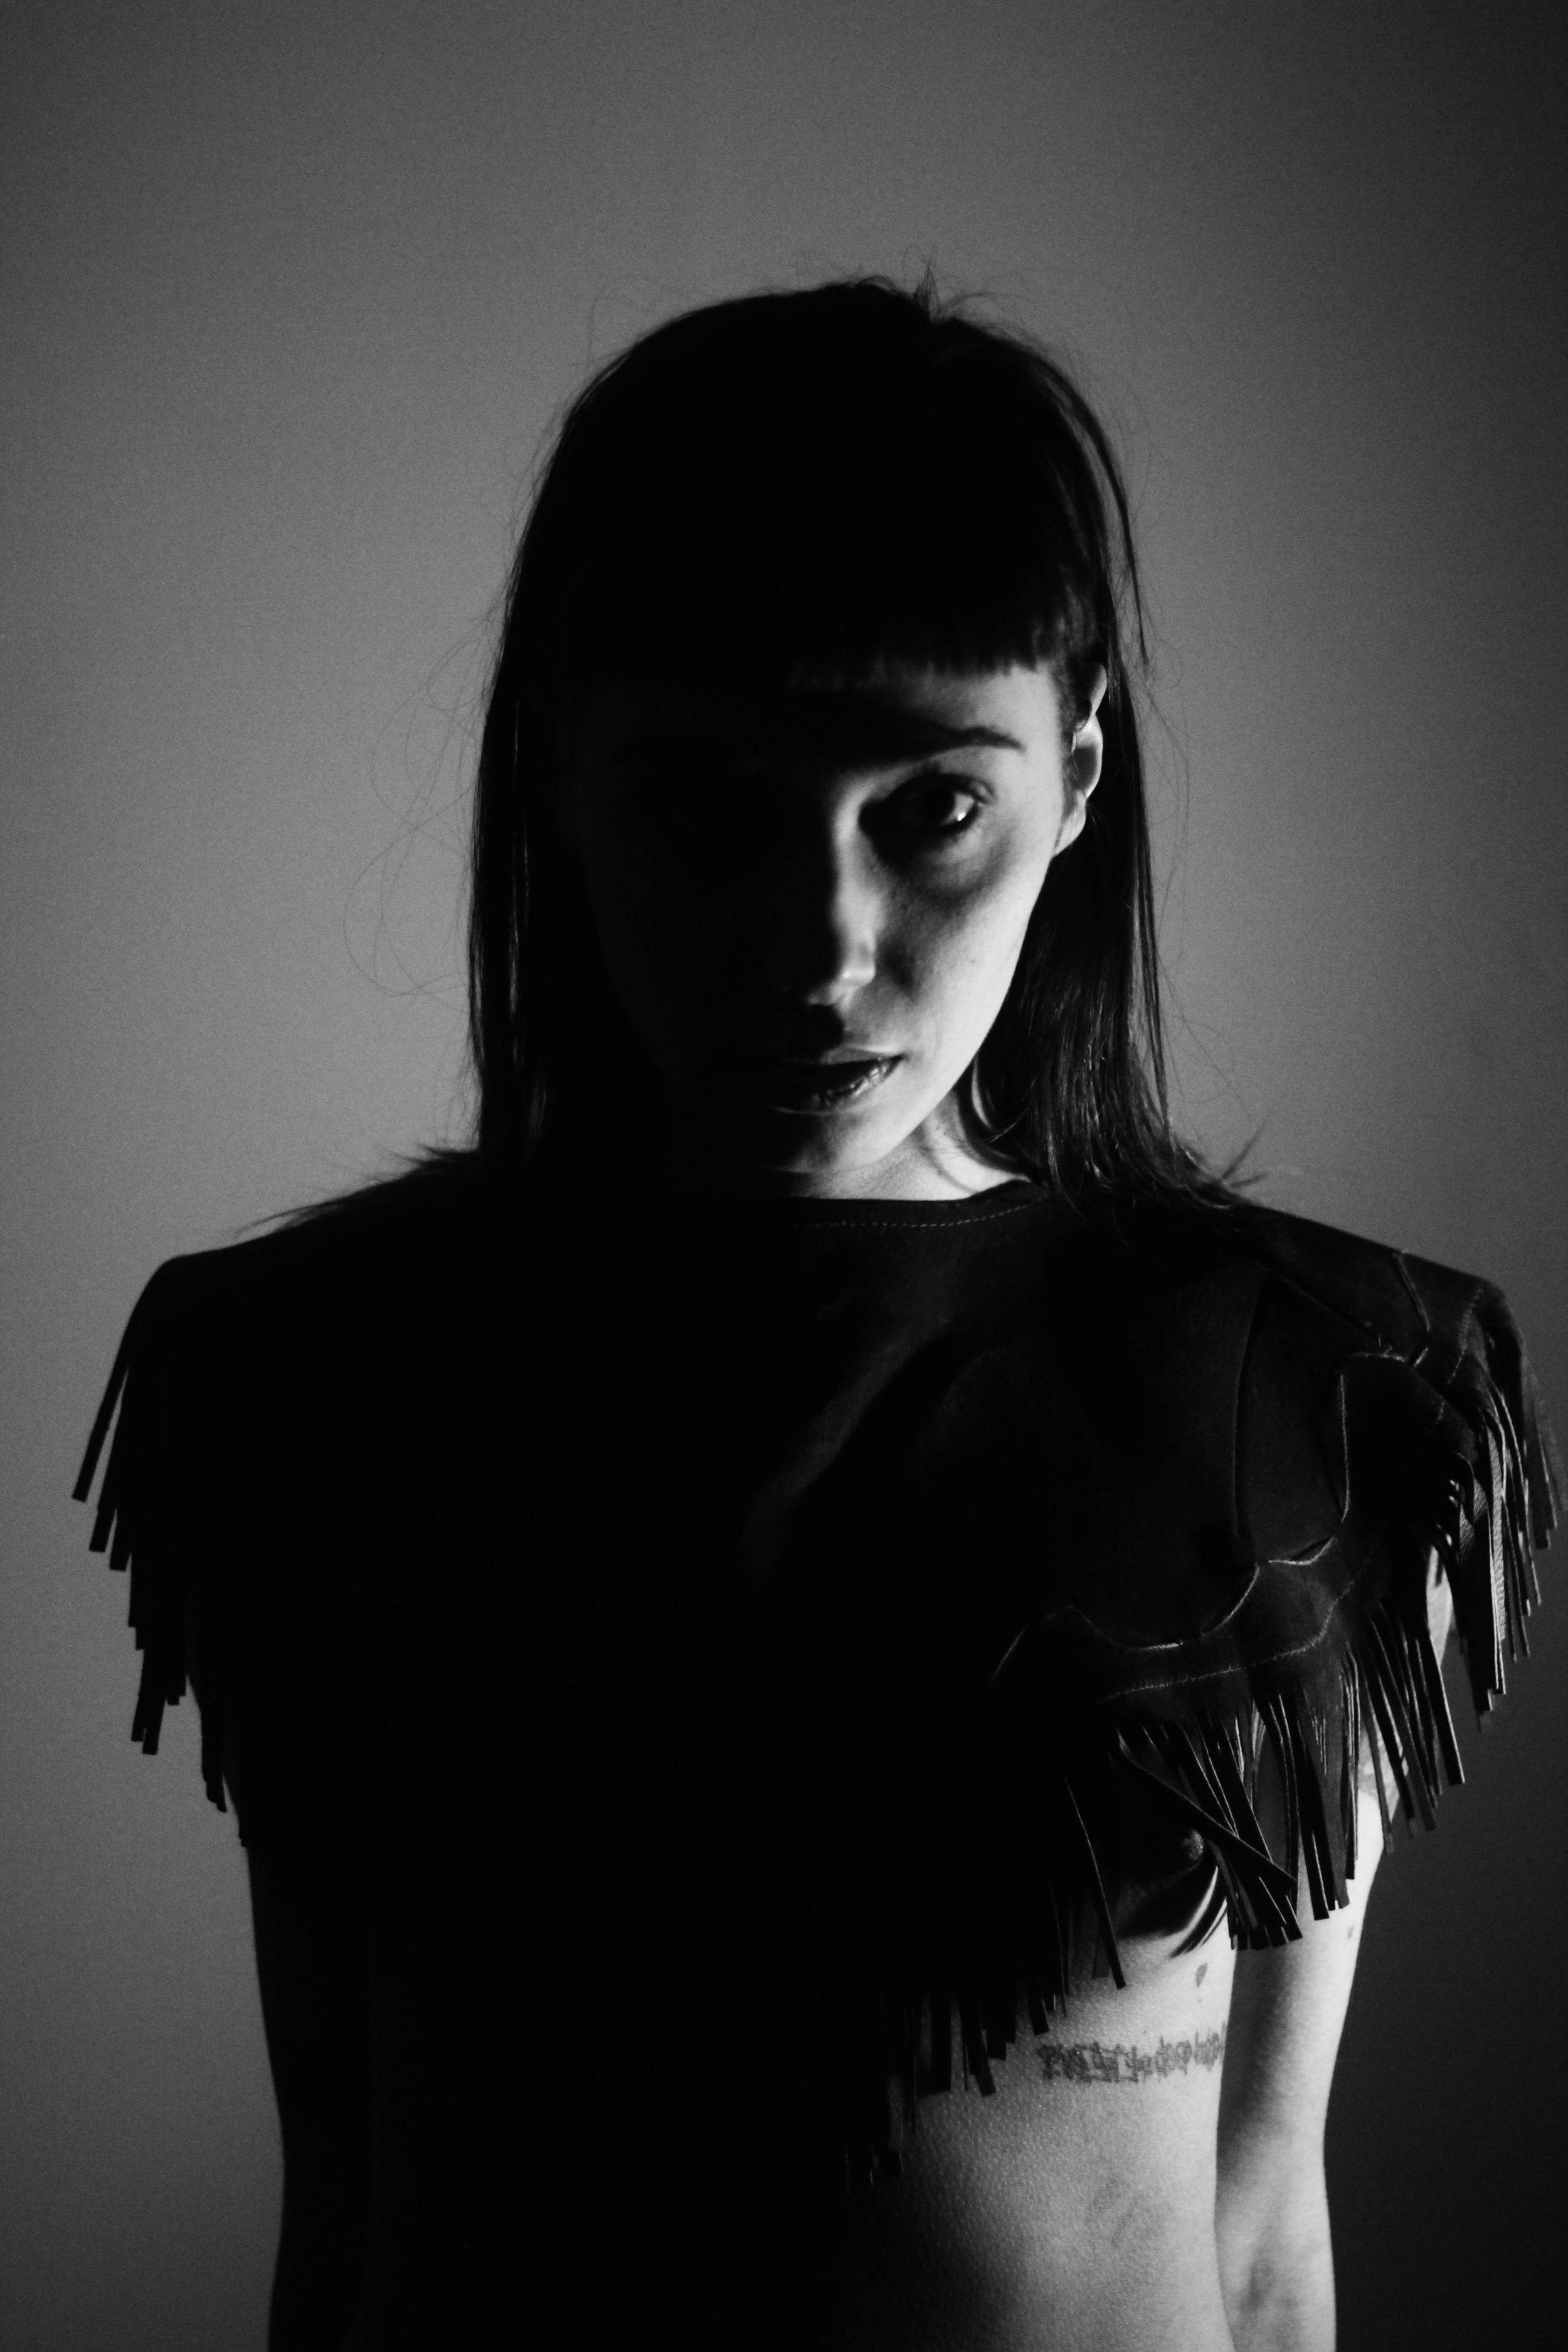 Carolina_Mencia-Sal_Nunkachov-21.jpg